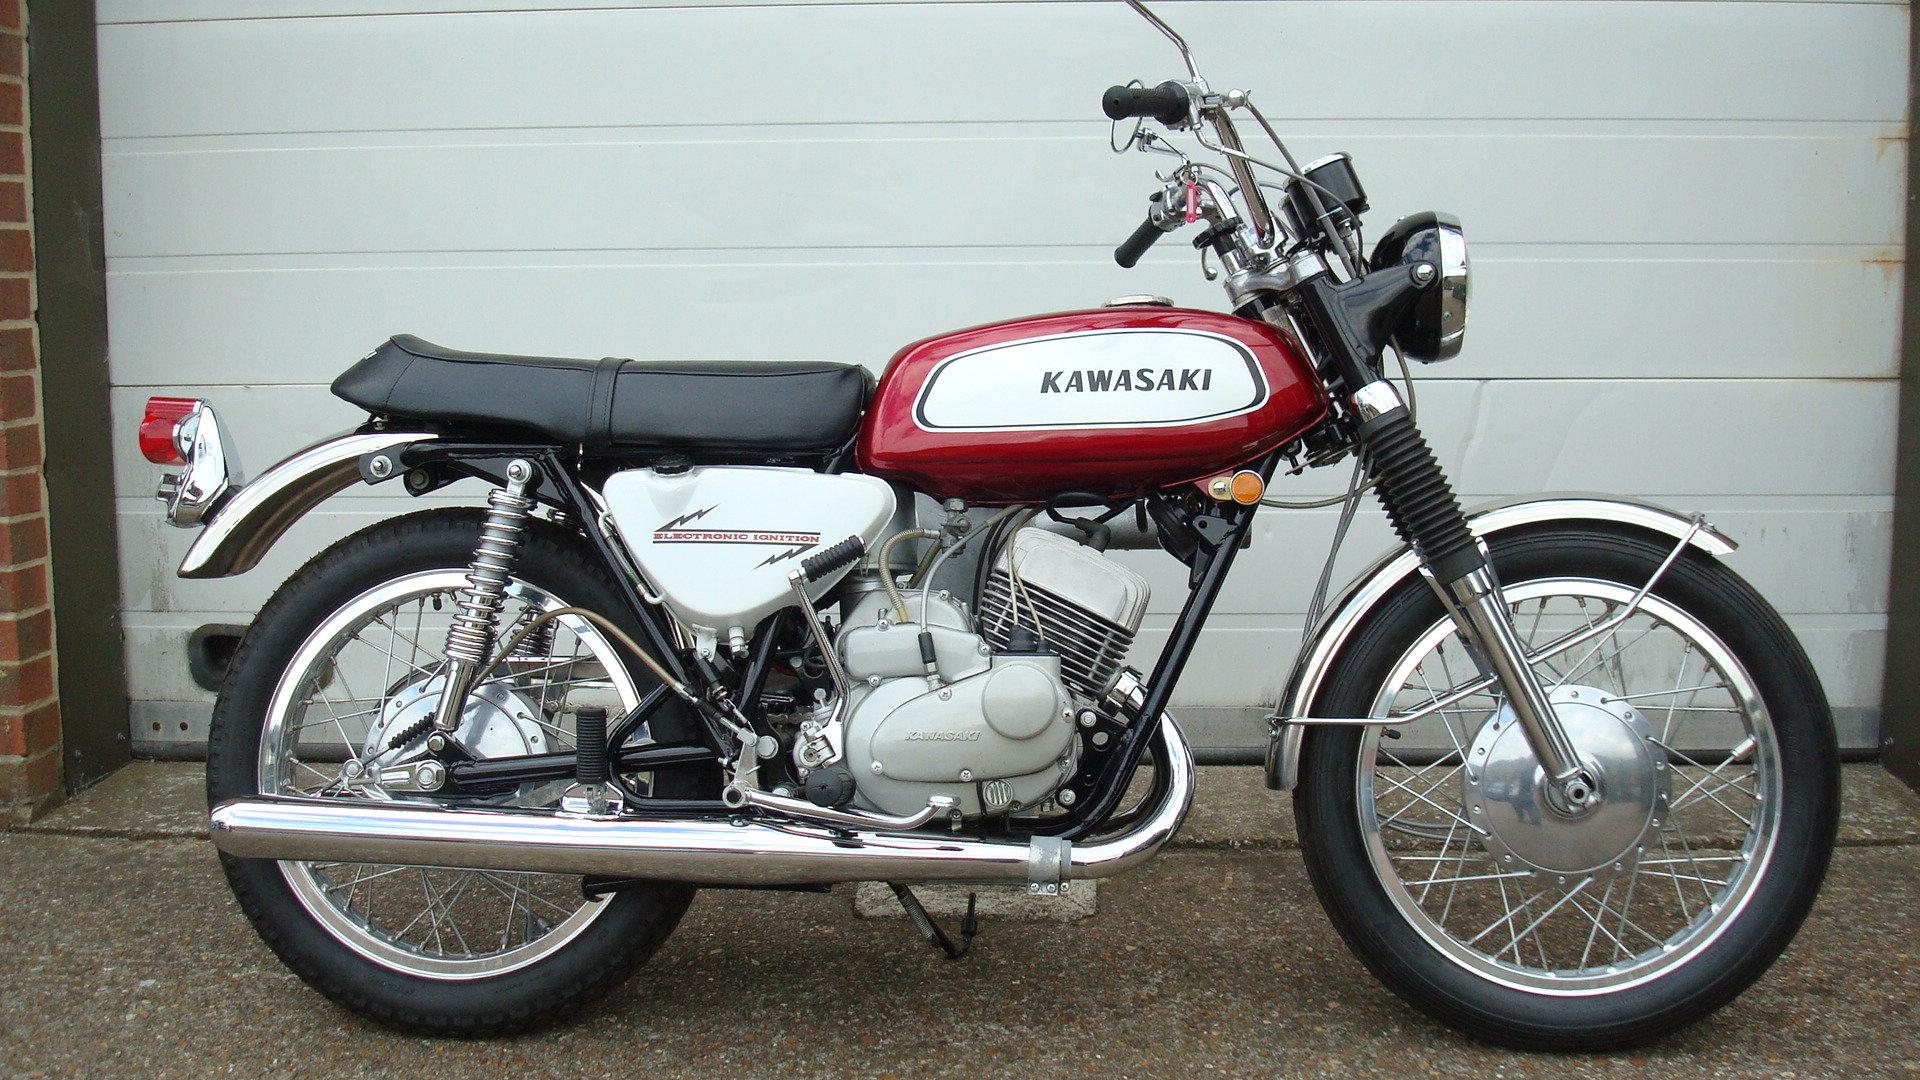 Kawasaki A1A Samurai 250 1970-J **SHOW STANDARD,RESTORED** For Sale (picture 1 of 10)